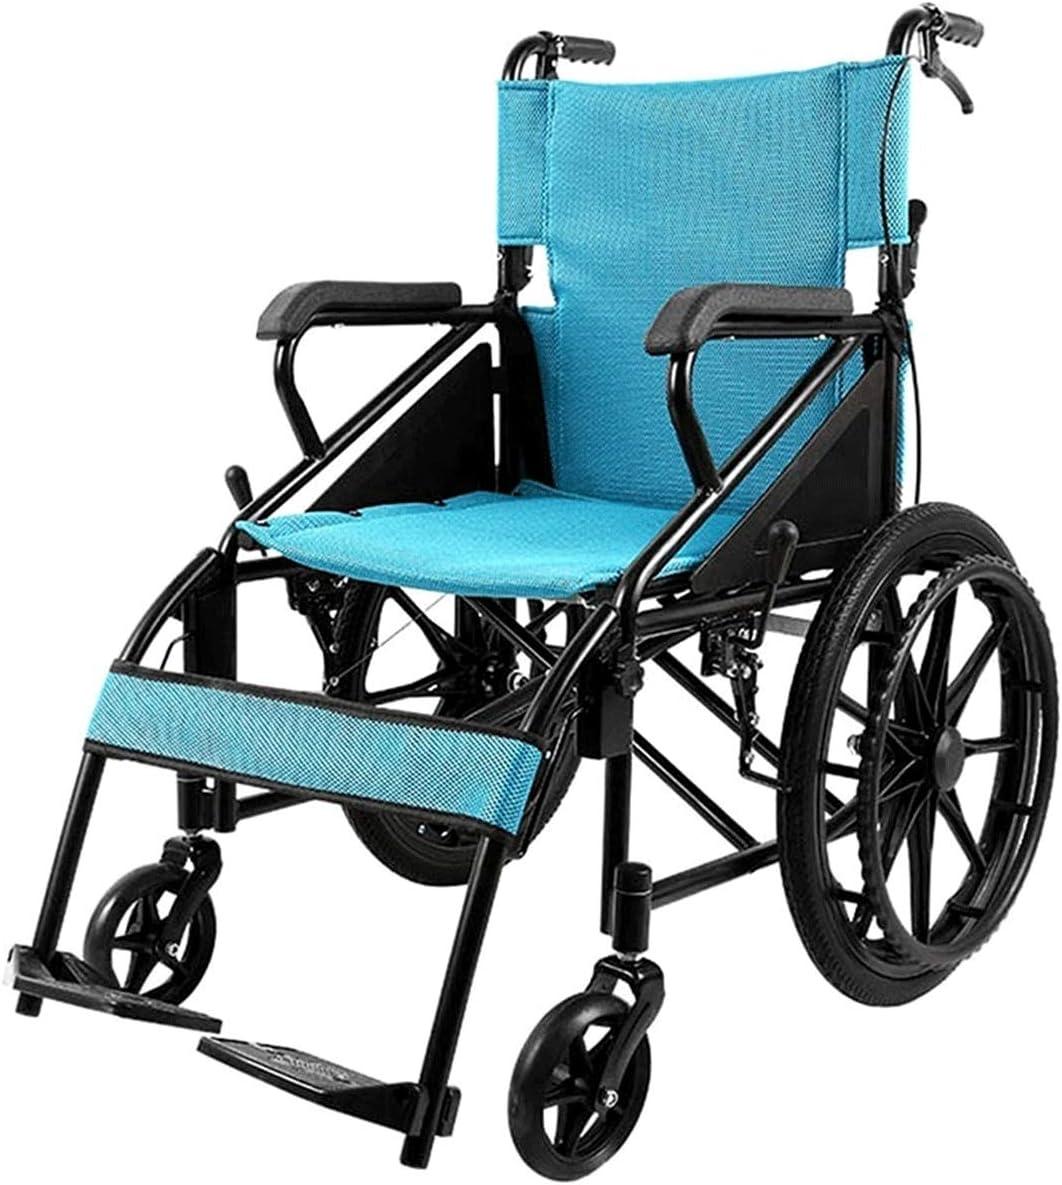 Folding wheelchair Portable Elderly Purchase Solid Wheelchair Whe Ranking TOP1